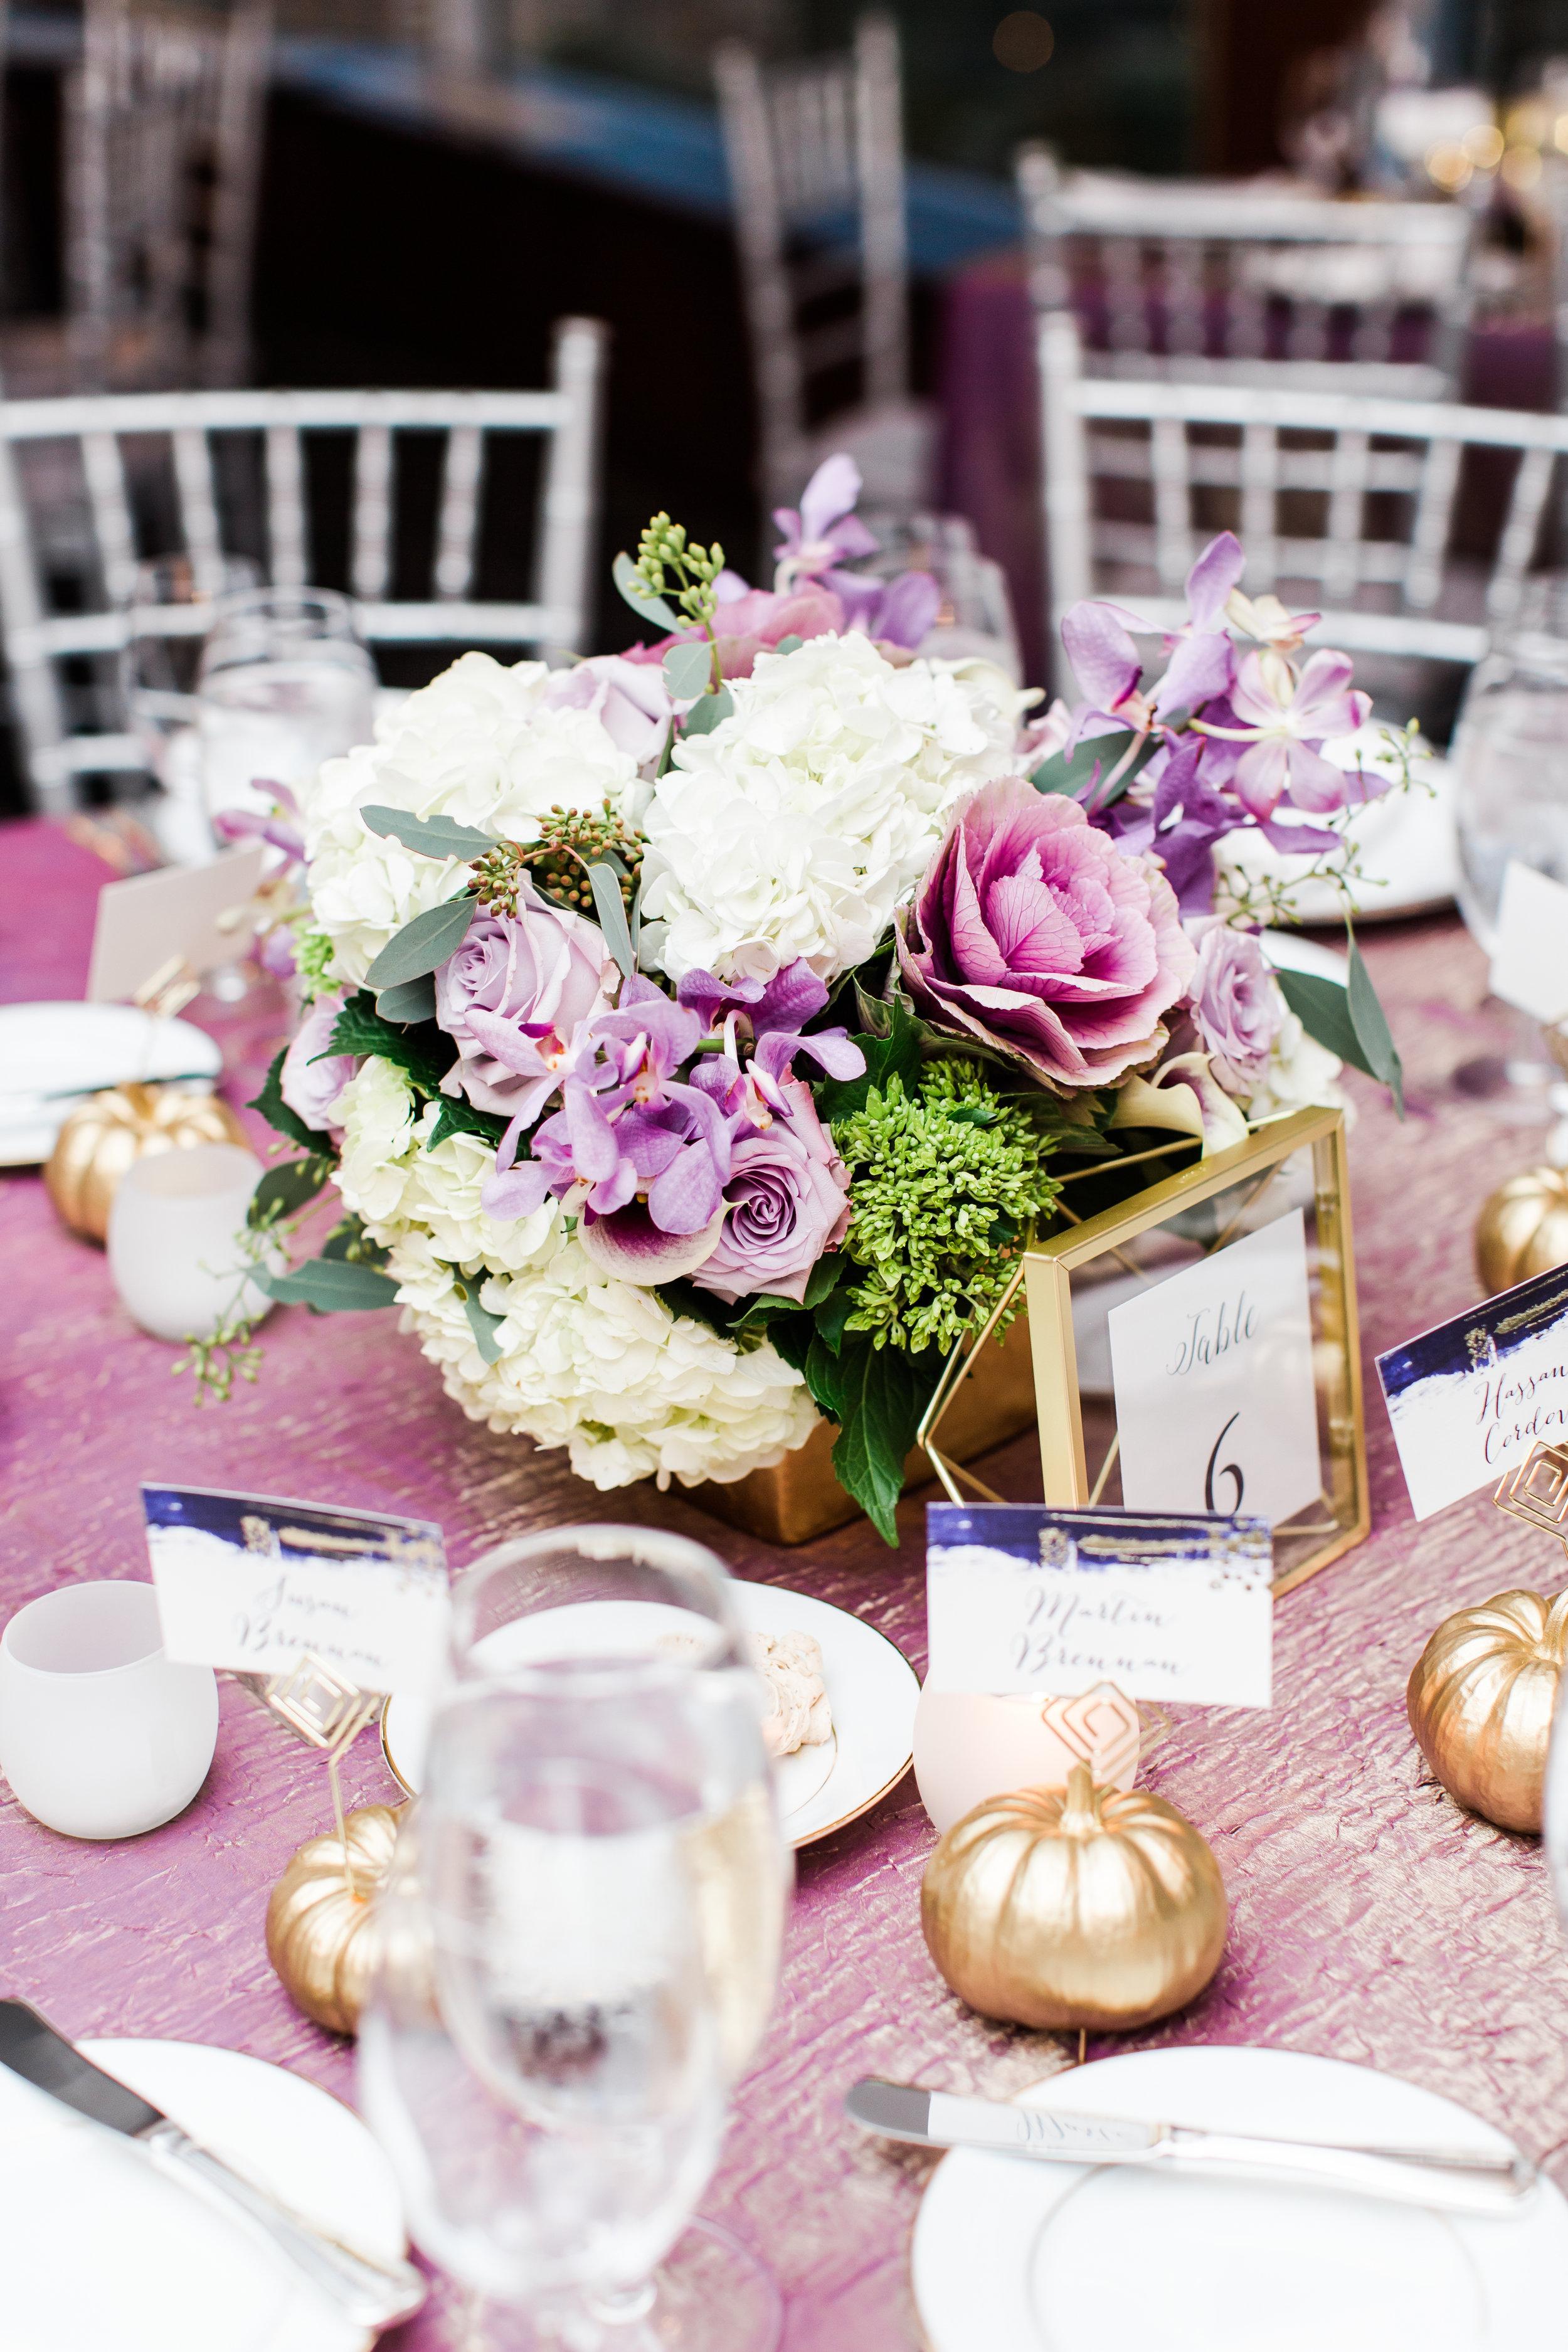 DavidAmandaMundy-Wedding-10282017-KathrynIvyPhotography-425.jpg